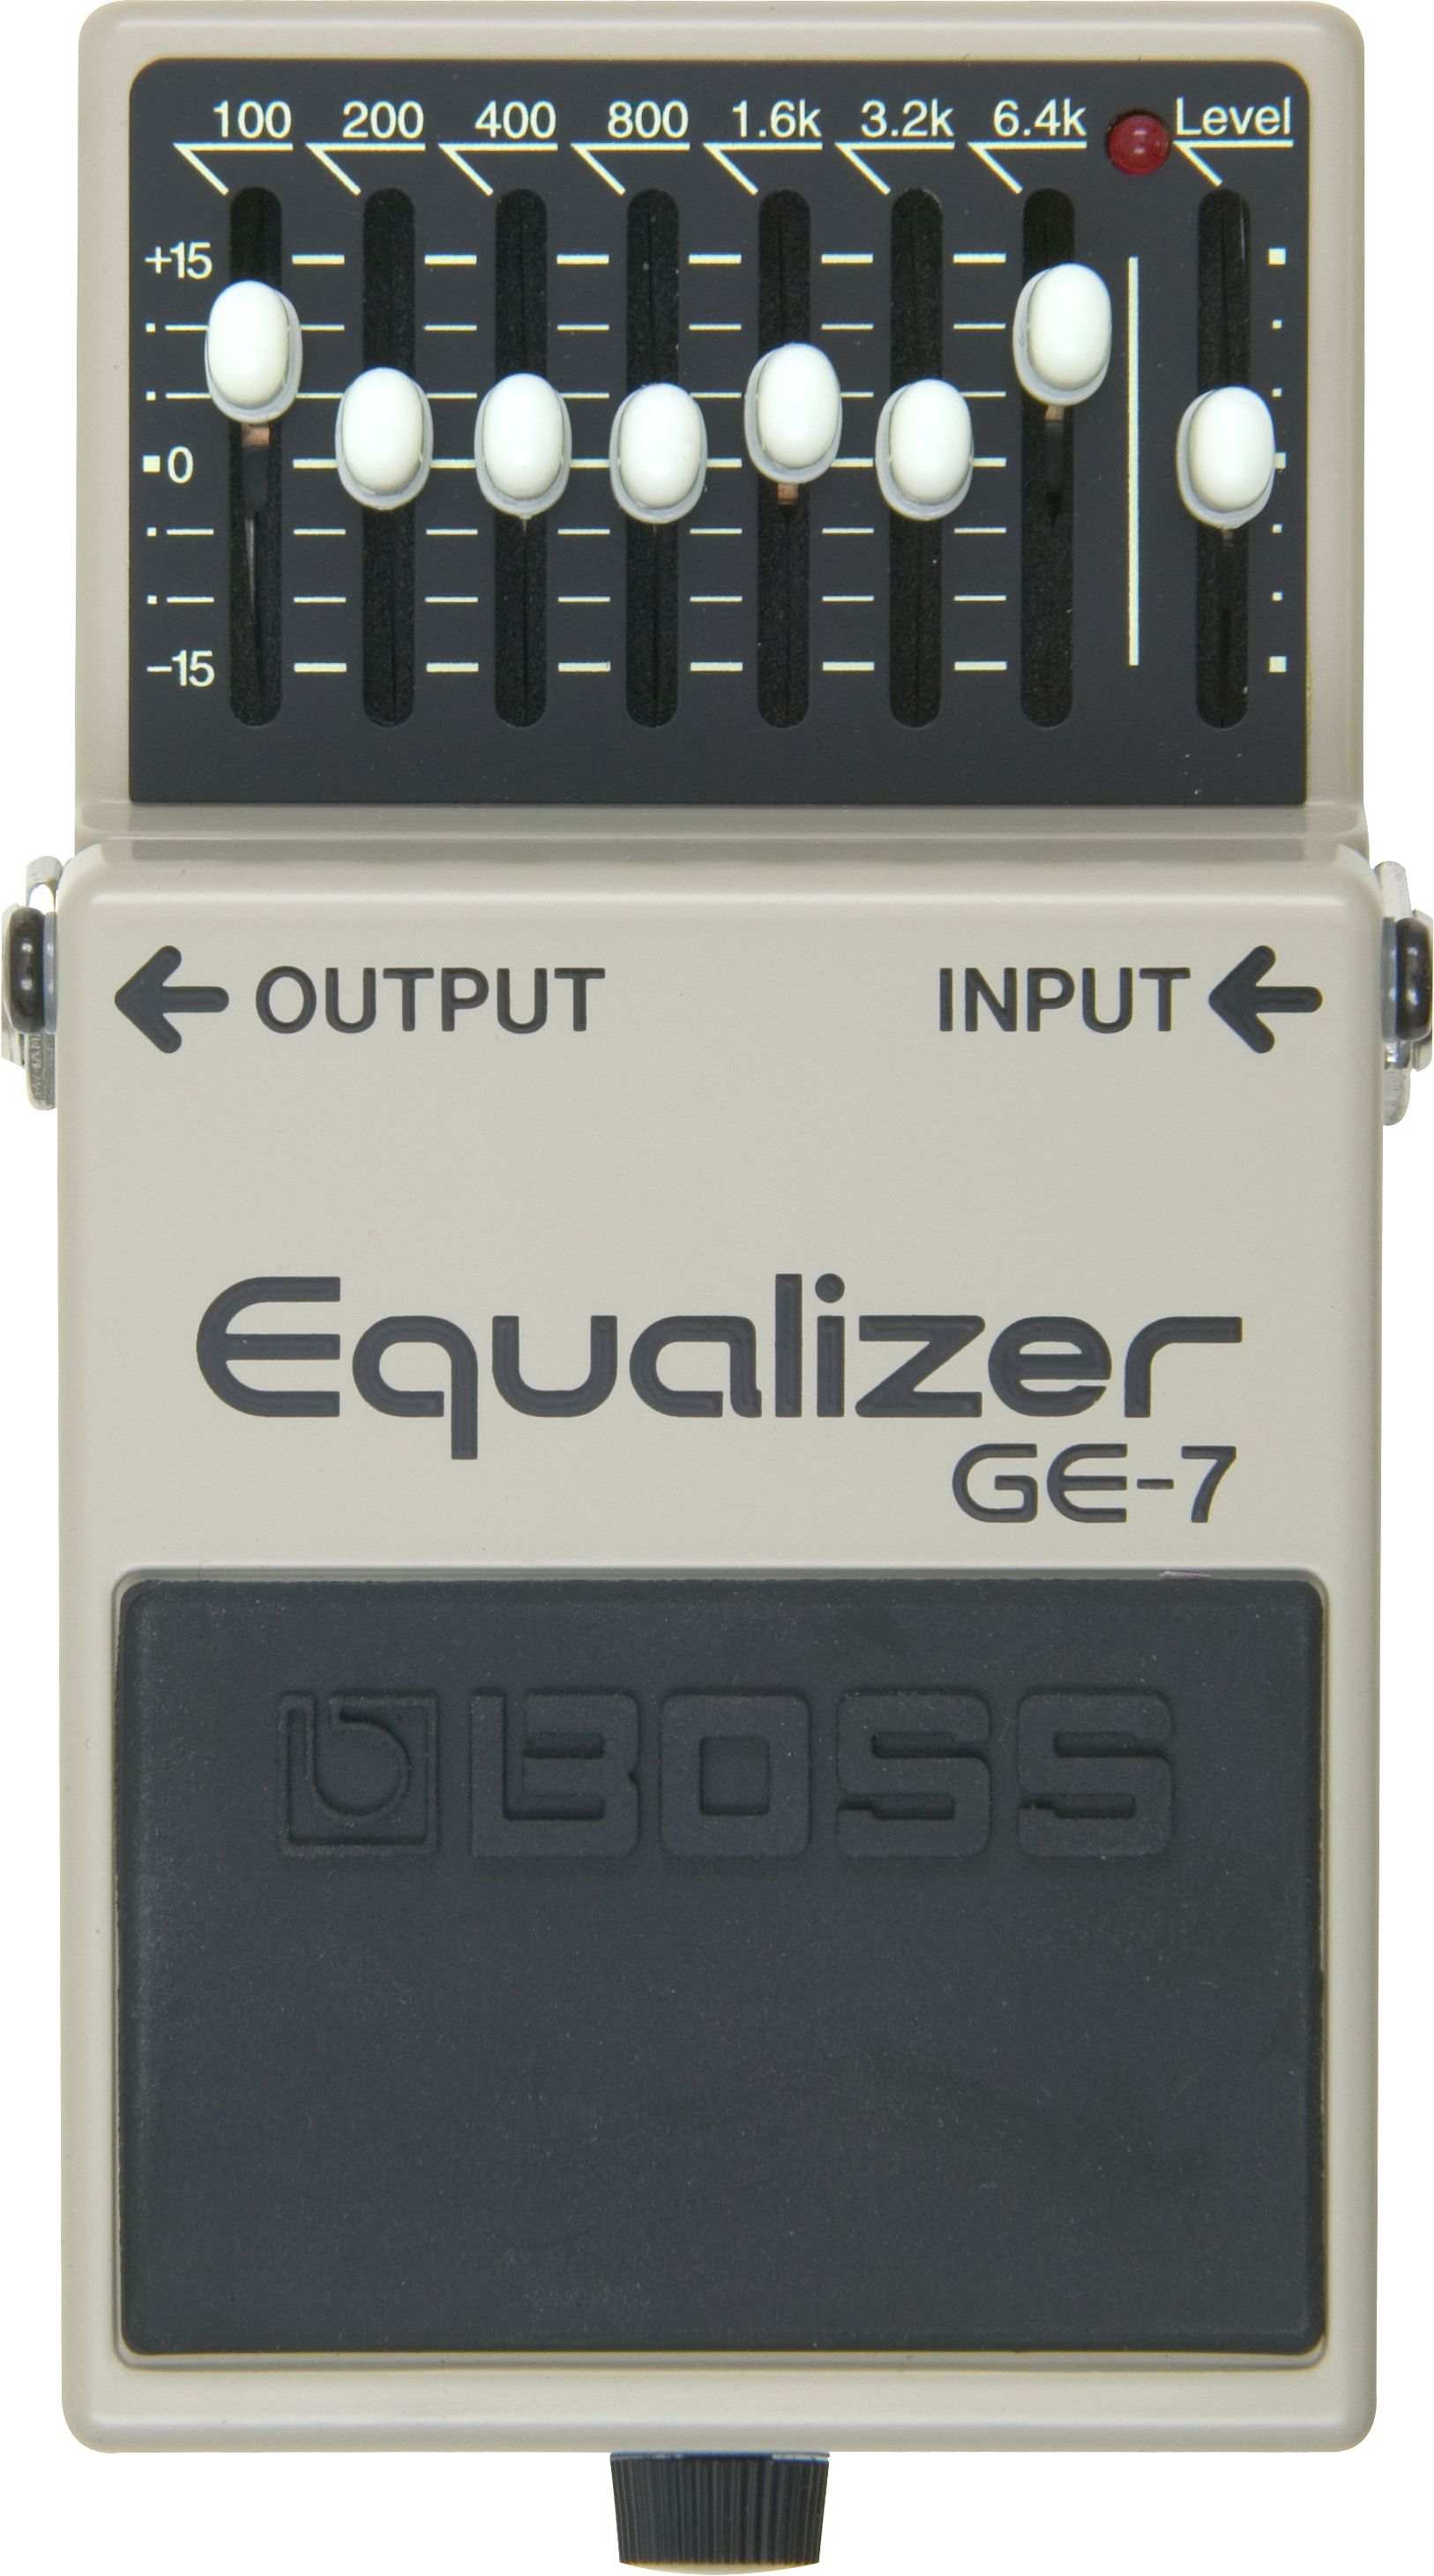 boss ge 7 equalizer pedal music gear guitar effects pedals guitar pedals guitar. Black Bedroom Furniture Sets. Home Design Ideas